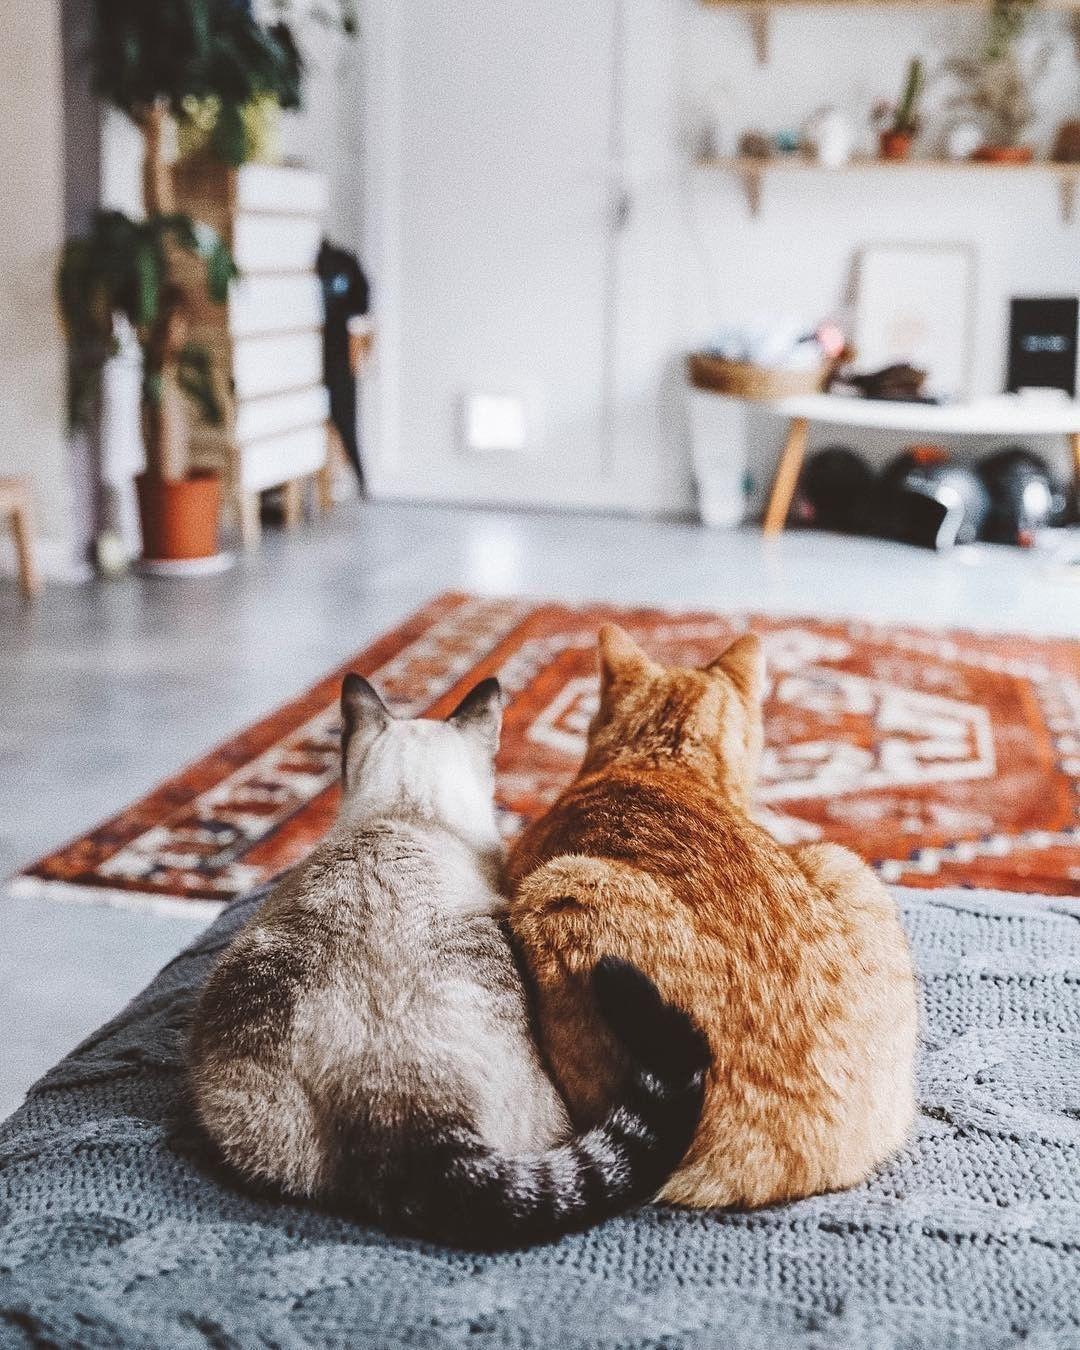 Pin Ot Polzovatelya Kateee Na Doske In Love With Cats